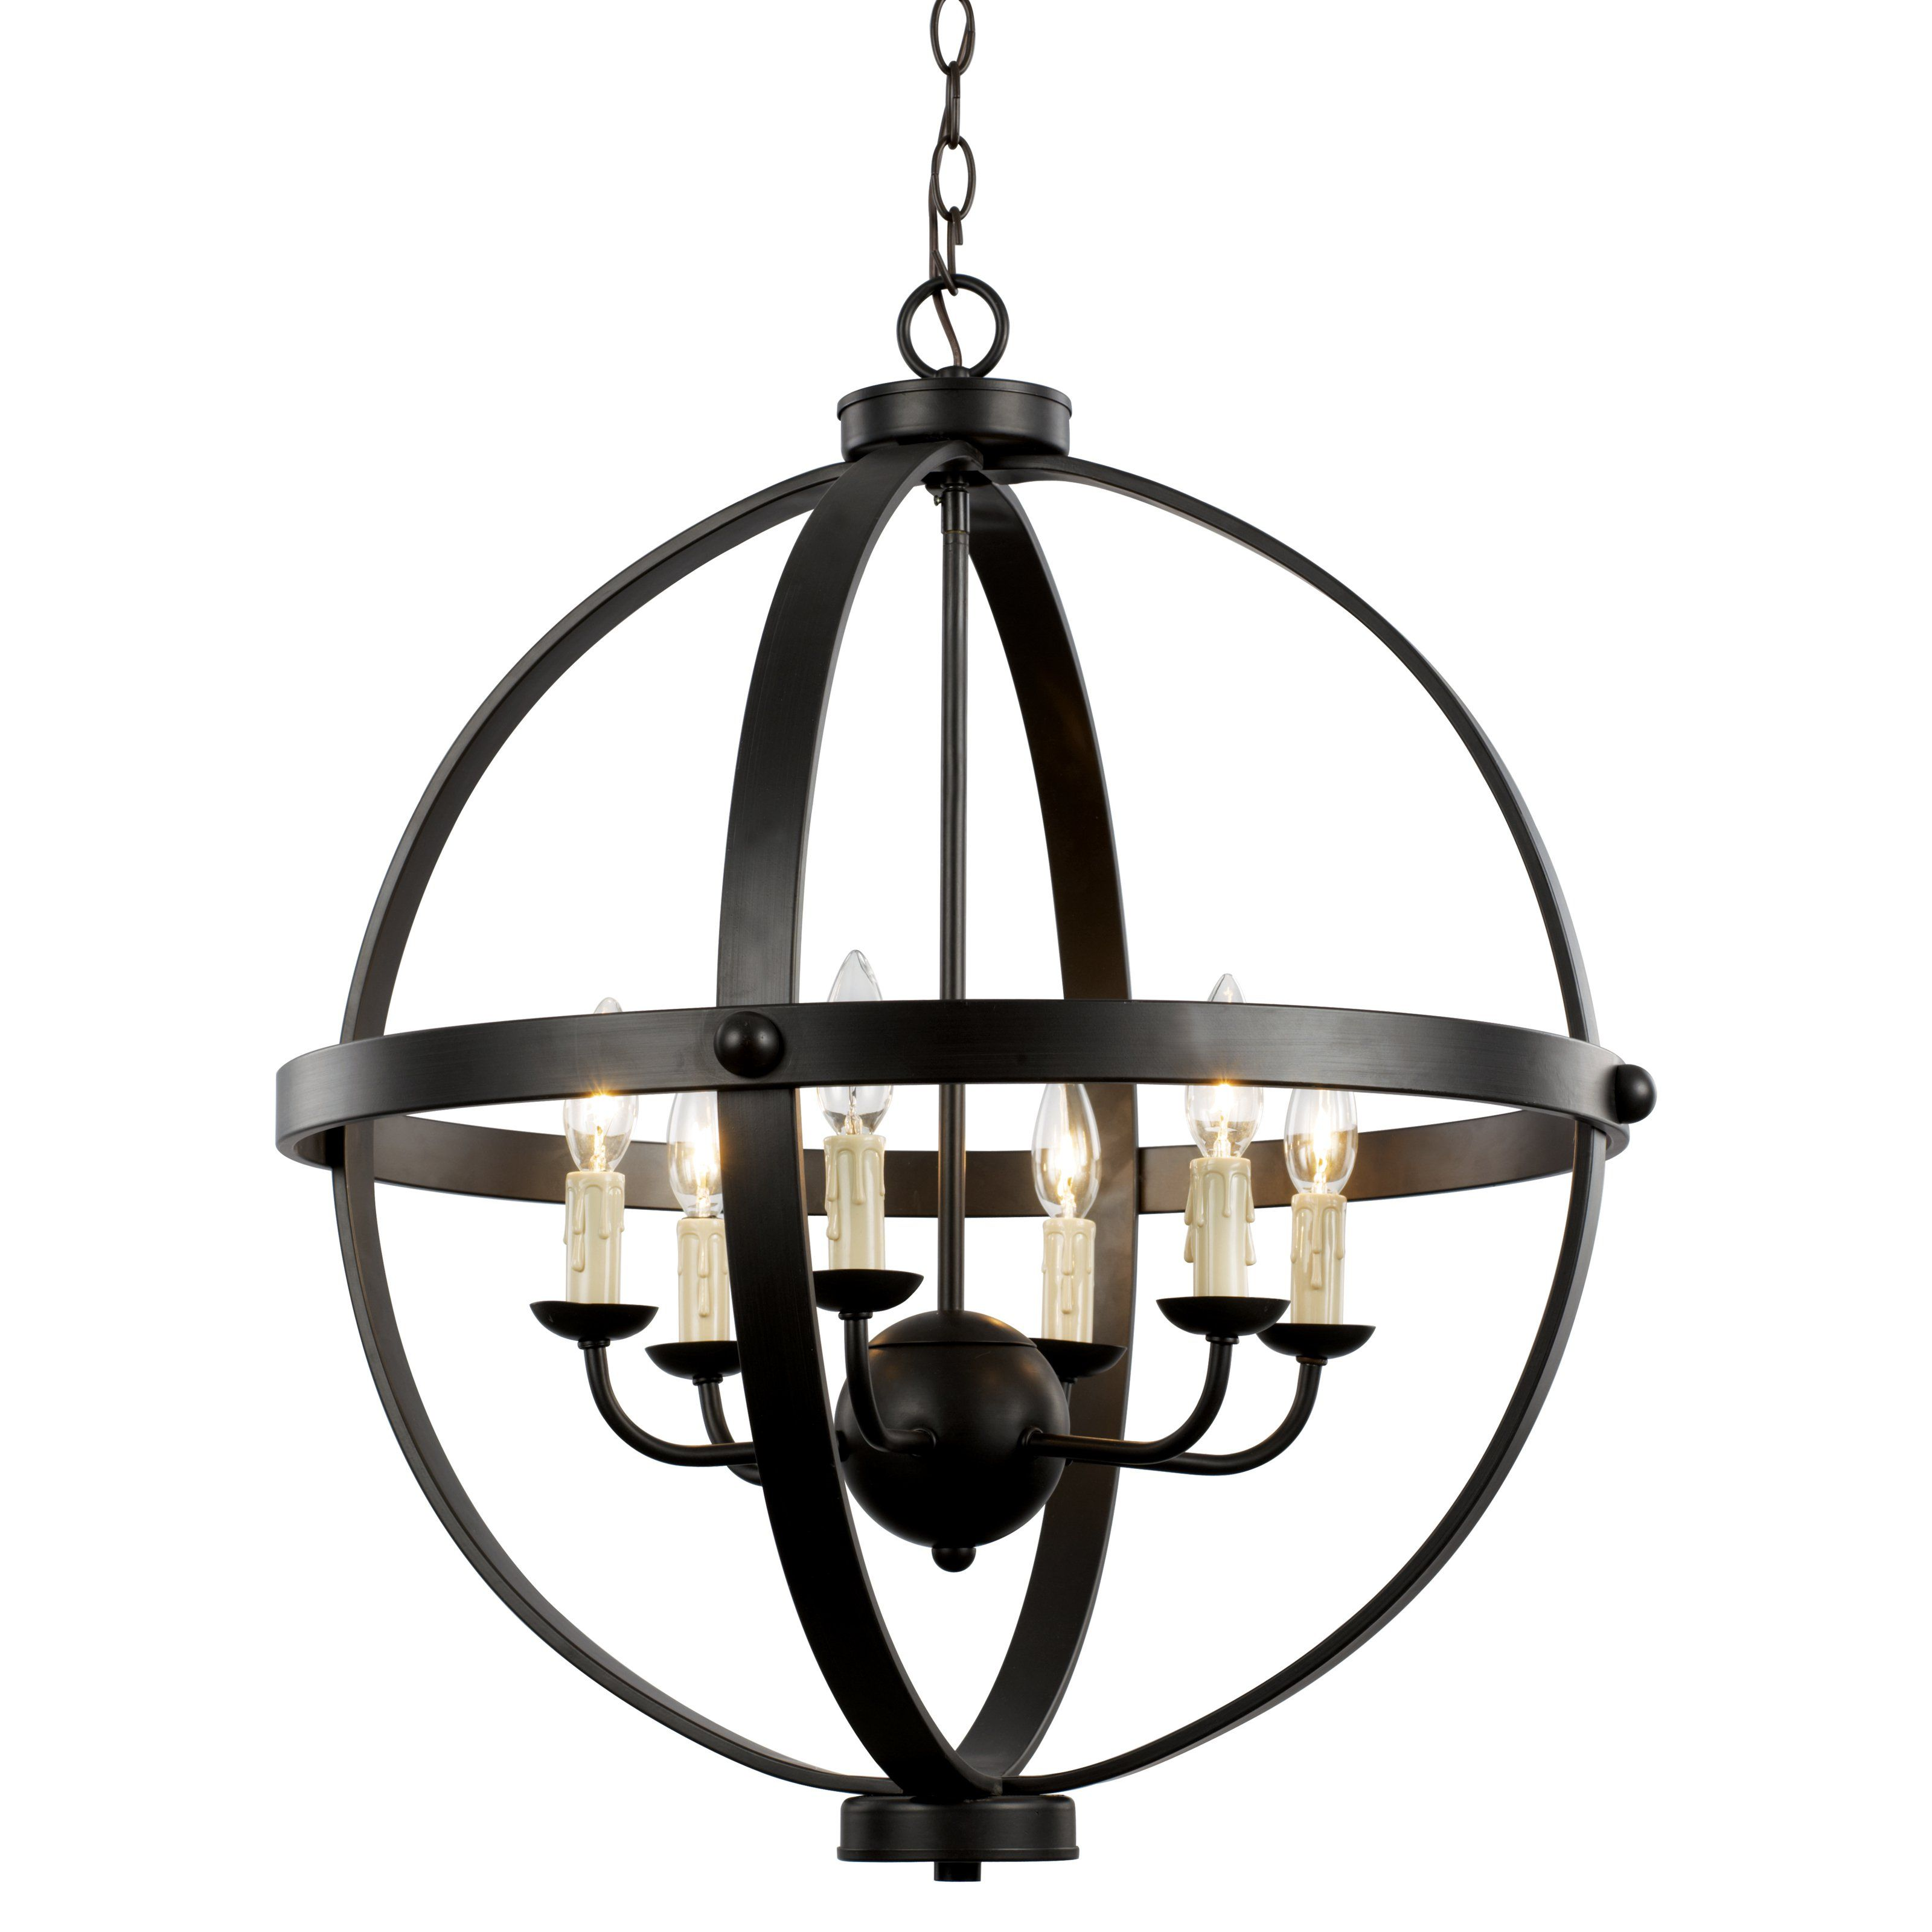 Trans Globe Lighting 70596 Rob Old World Sphere Chandelier 416 Hayneedle